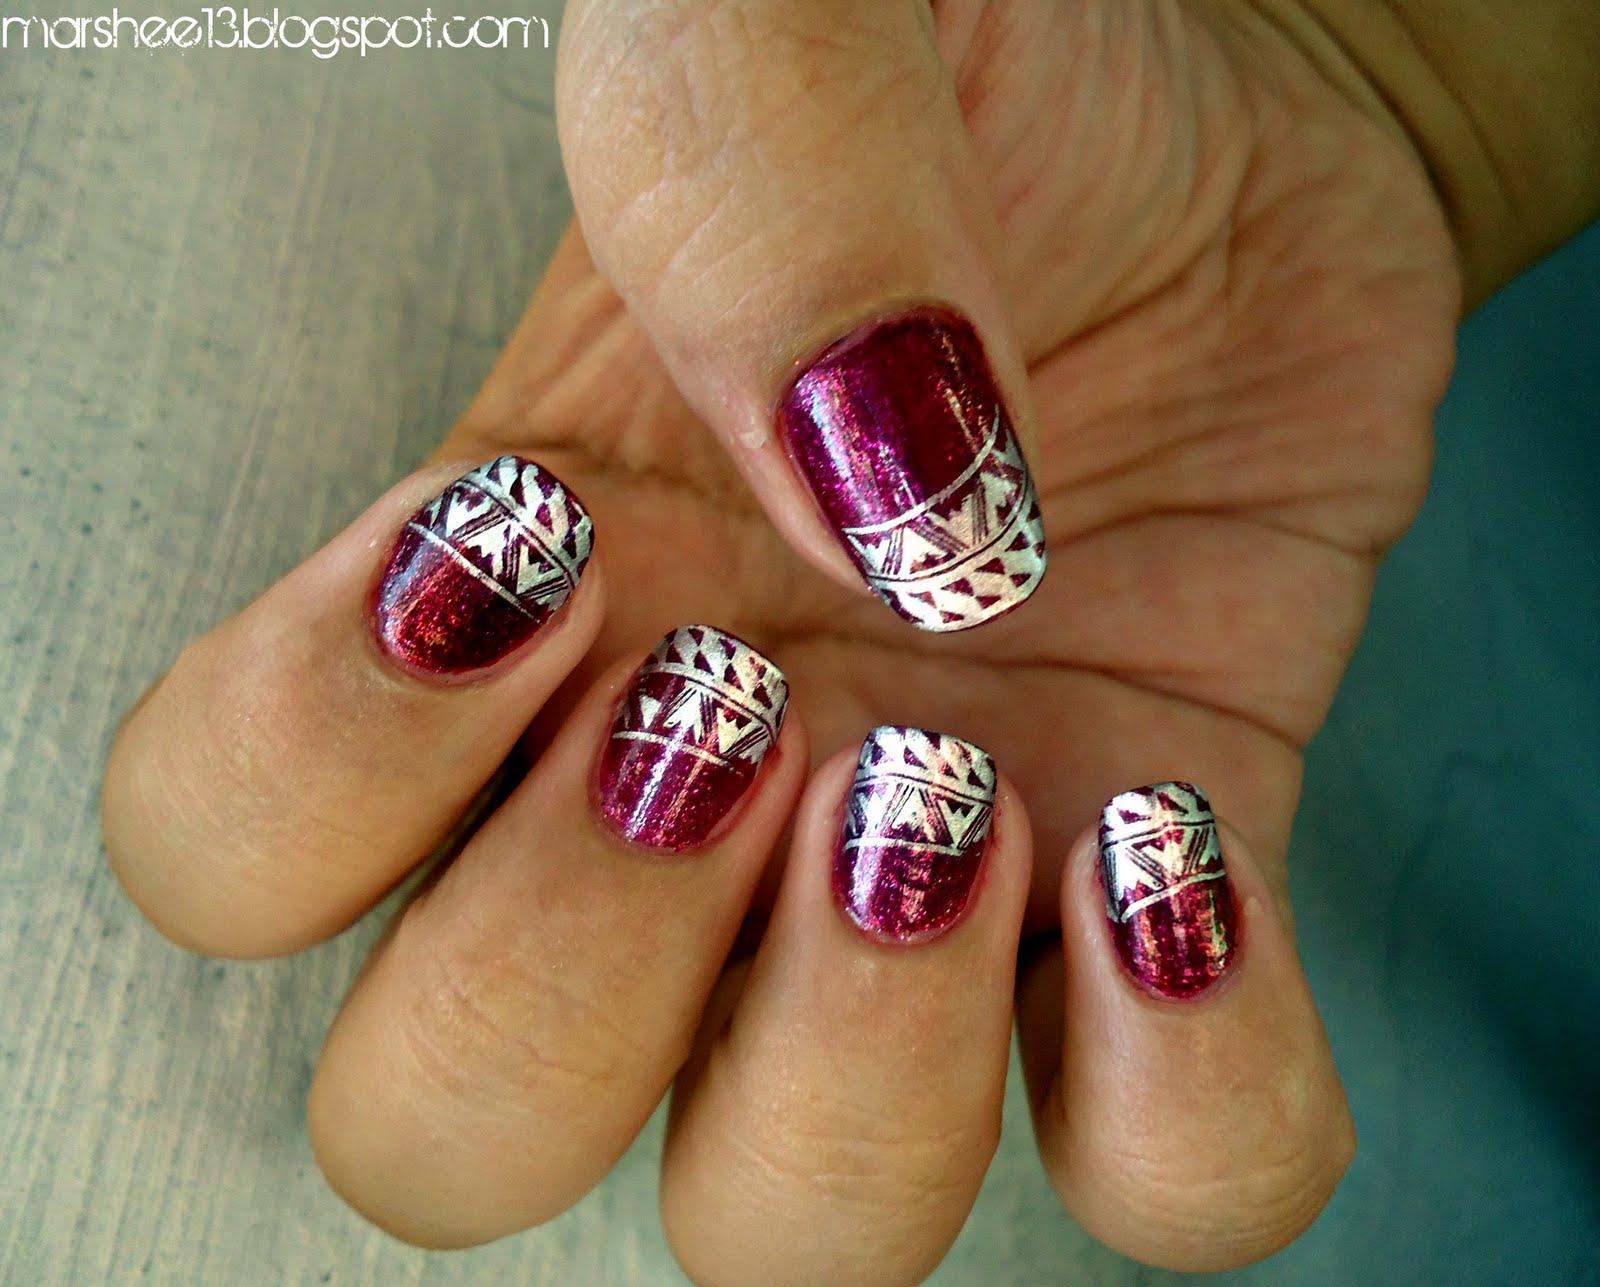 Free Download Cool Nail Designs Tumblr Joy Studio Design Gallery Best